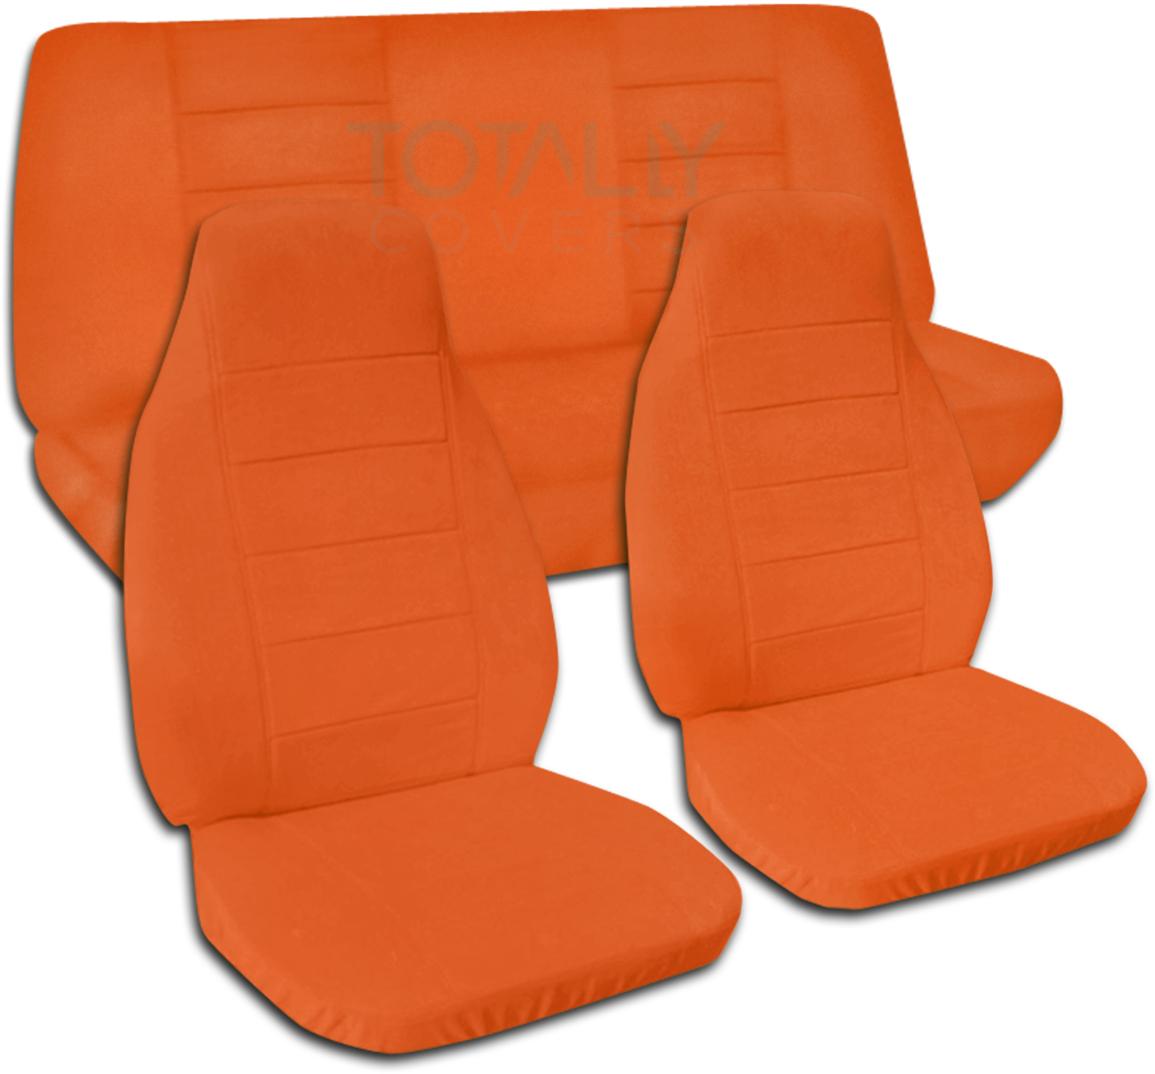 orange jeep seat covers velcromag. Black Bedroom Furniture Sets. Home Design Ideas